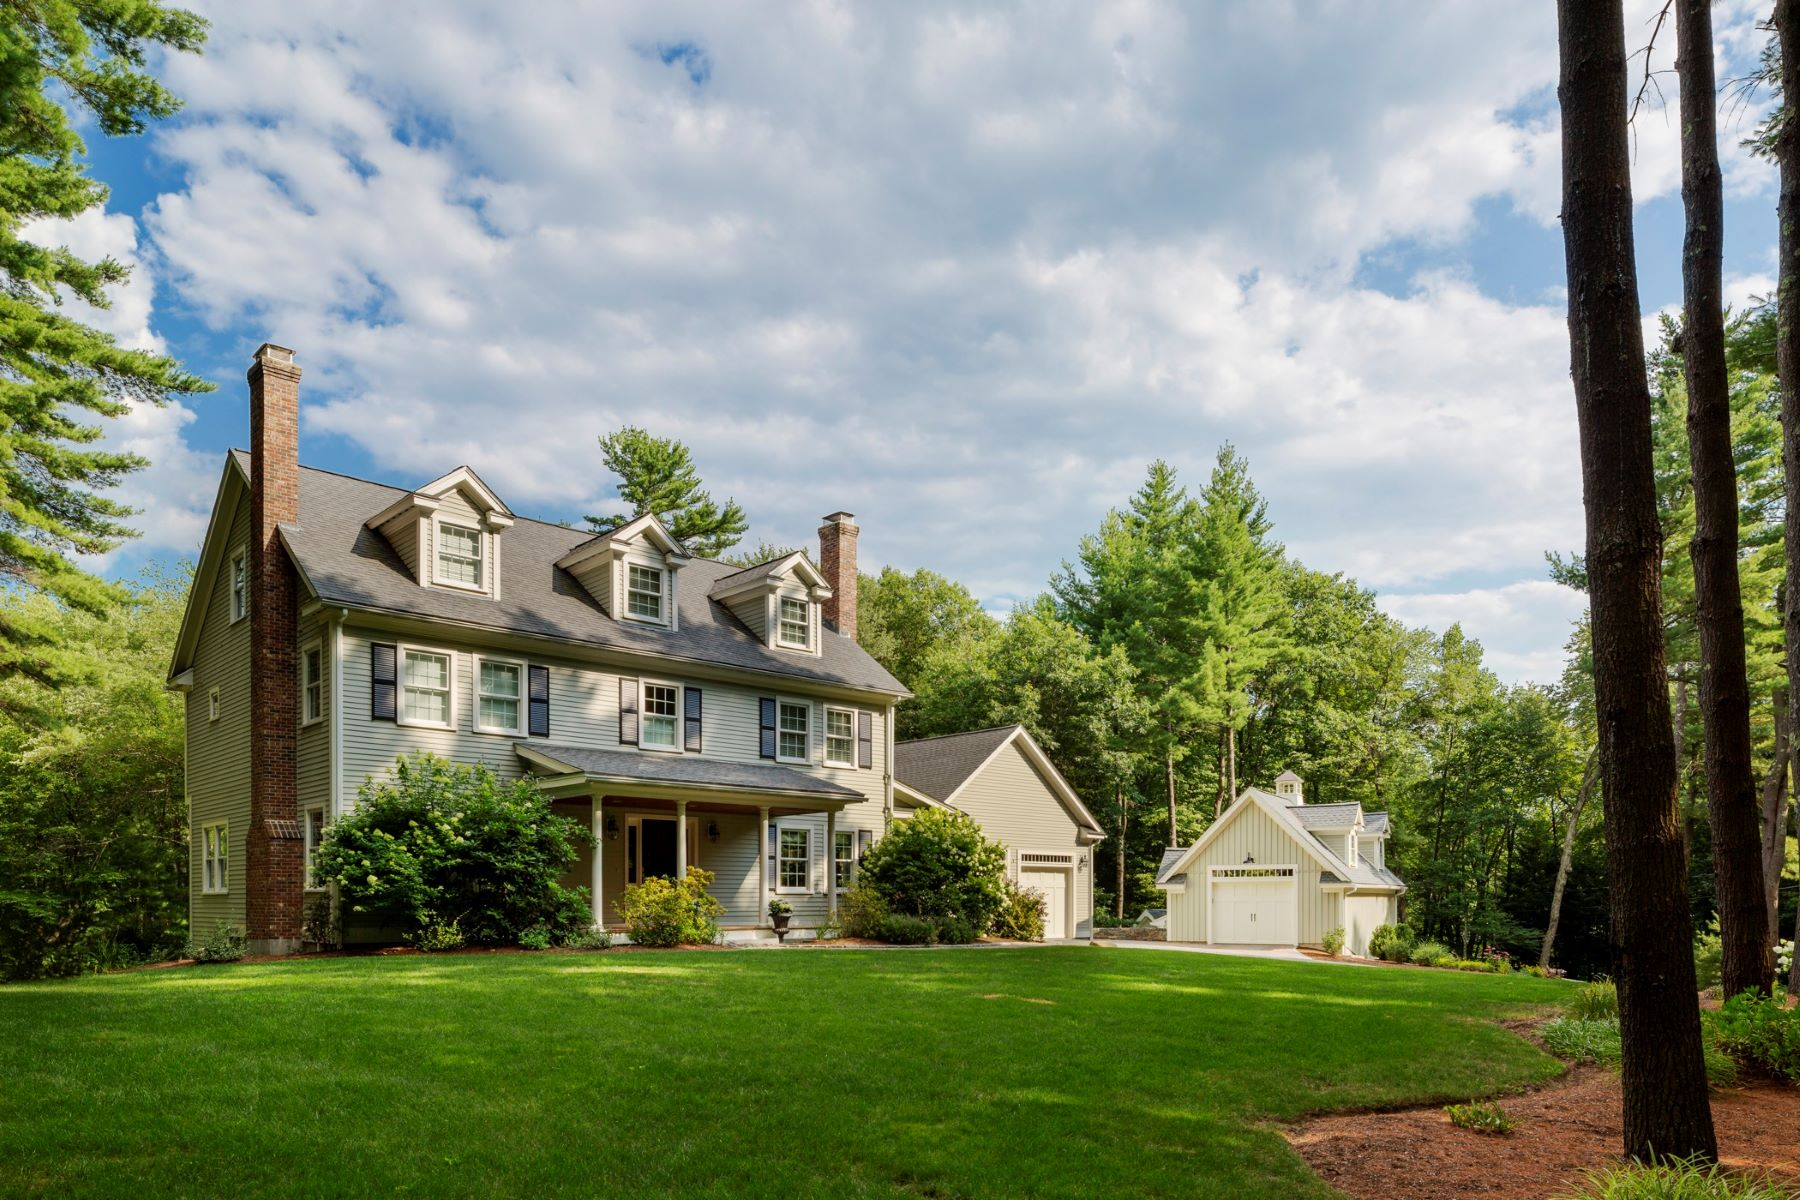 獨棟家庭住宅 為 出售 在 Refreshing Elegant Colonial 155 Woodridge Road Carlisle, 麻塞諸塞州, 01741 美國